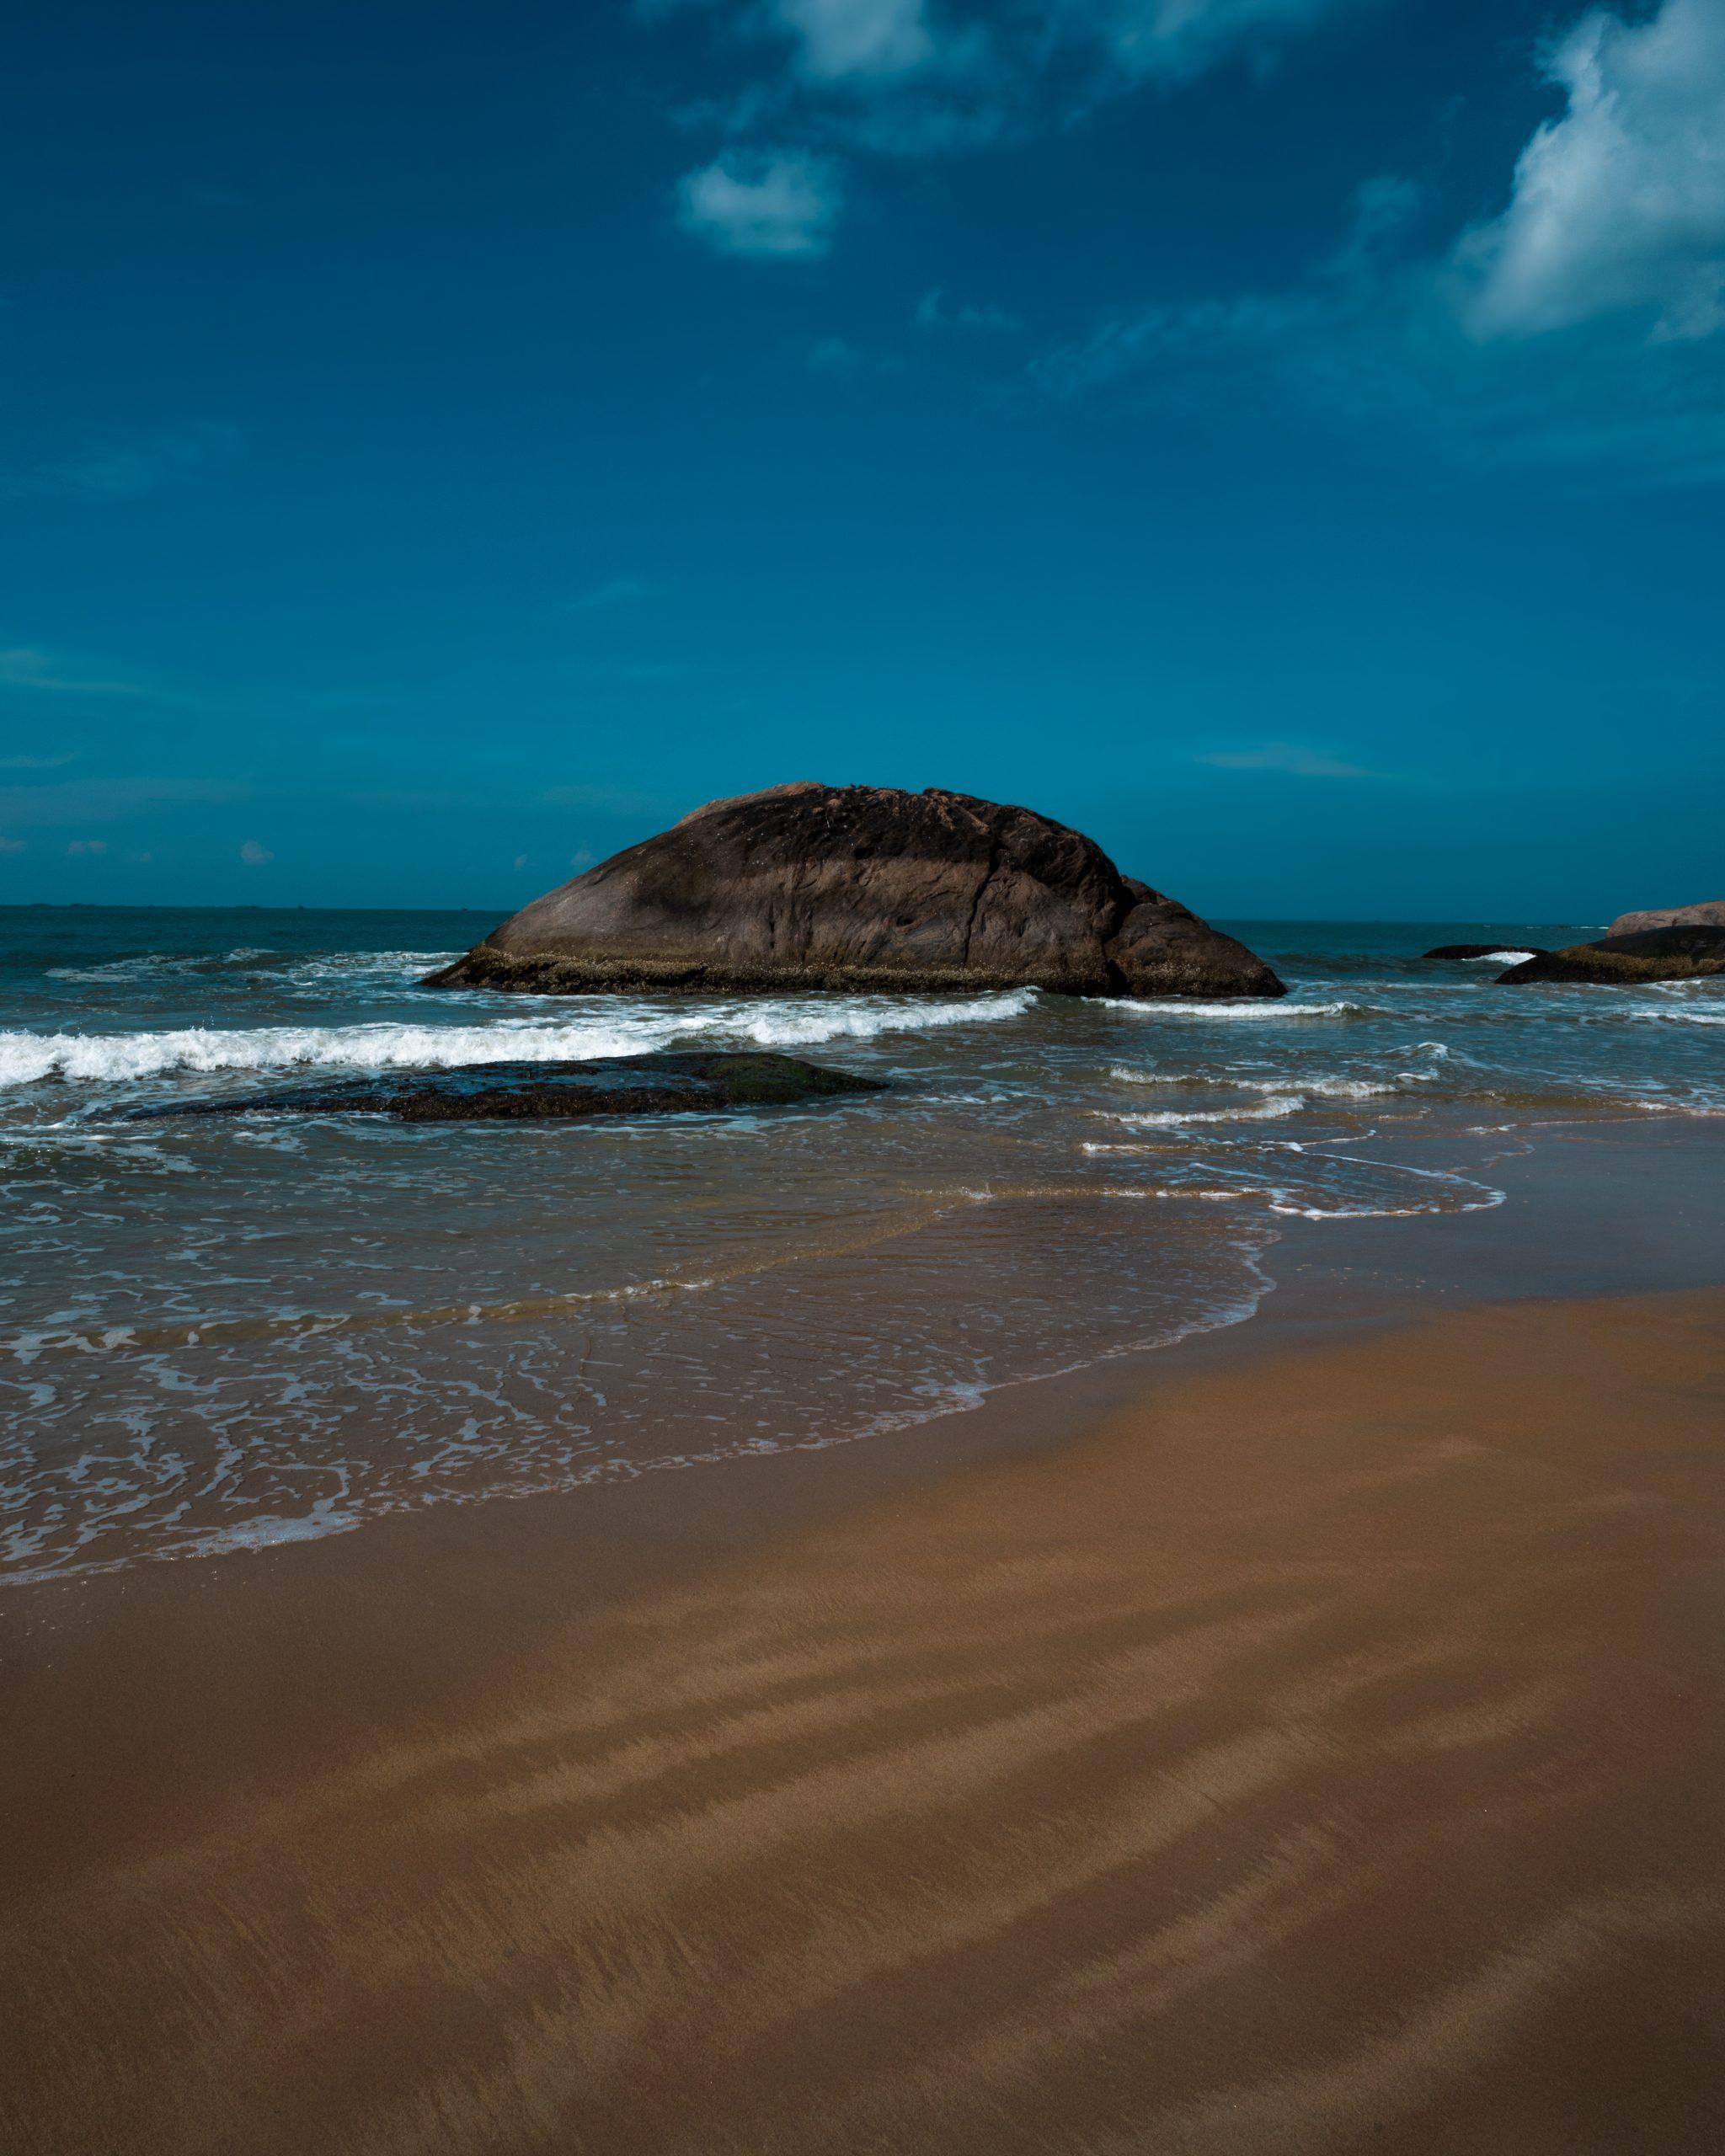 A sea waves reaching the shore